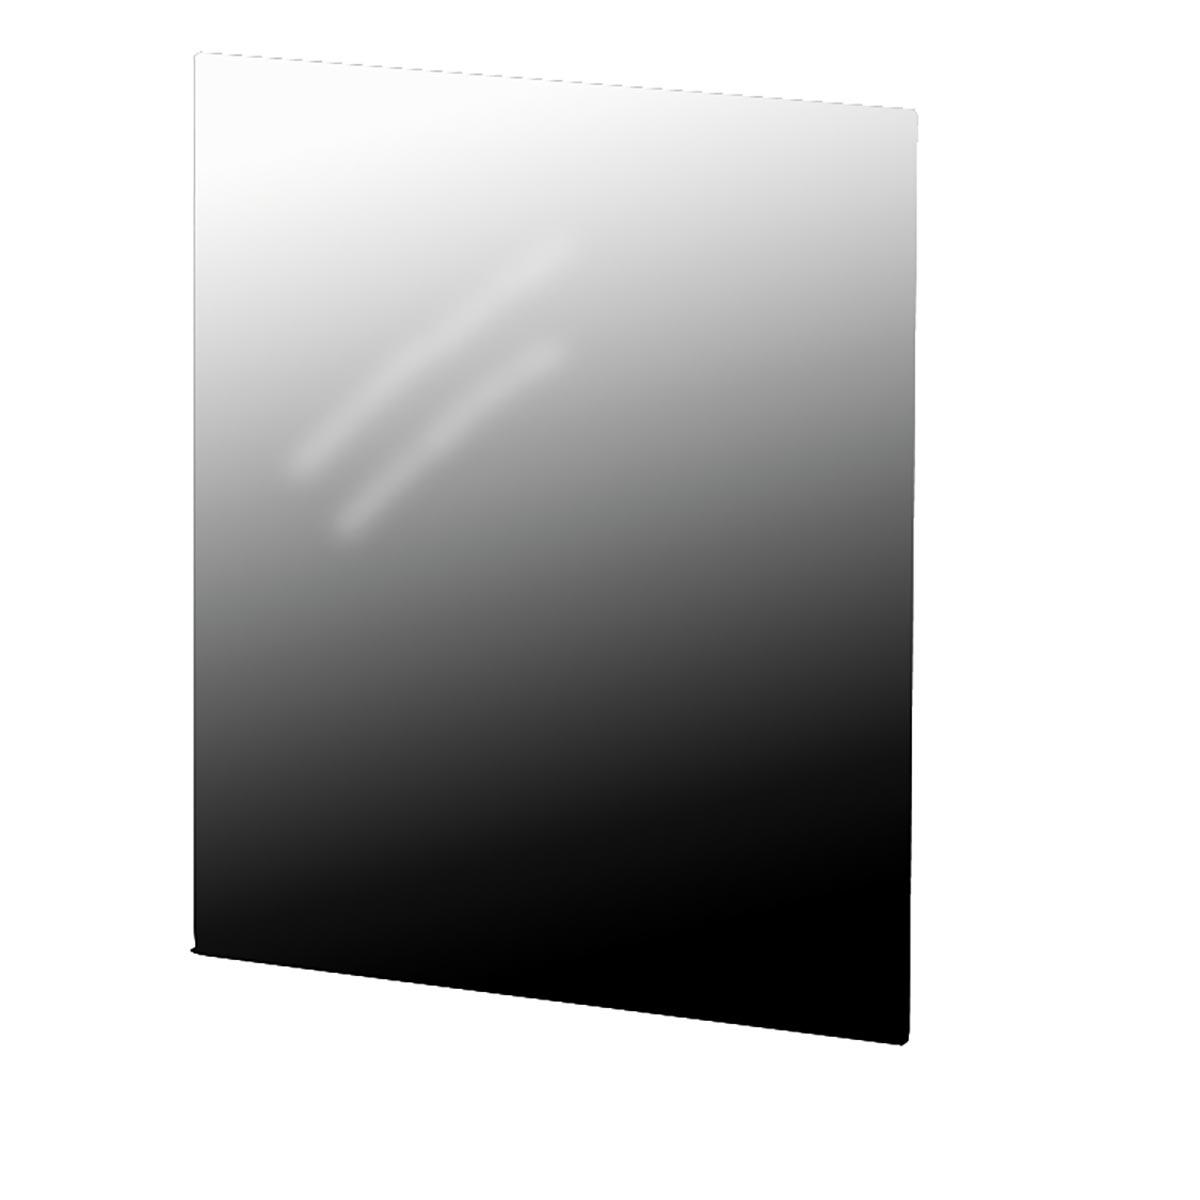 Miroir plan 1003532 u8475180 optique selon kr ncke for Miroir plan optique